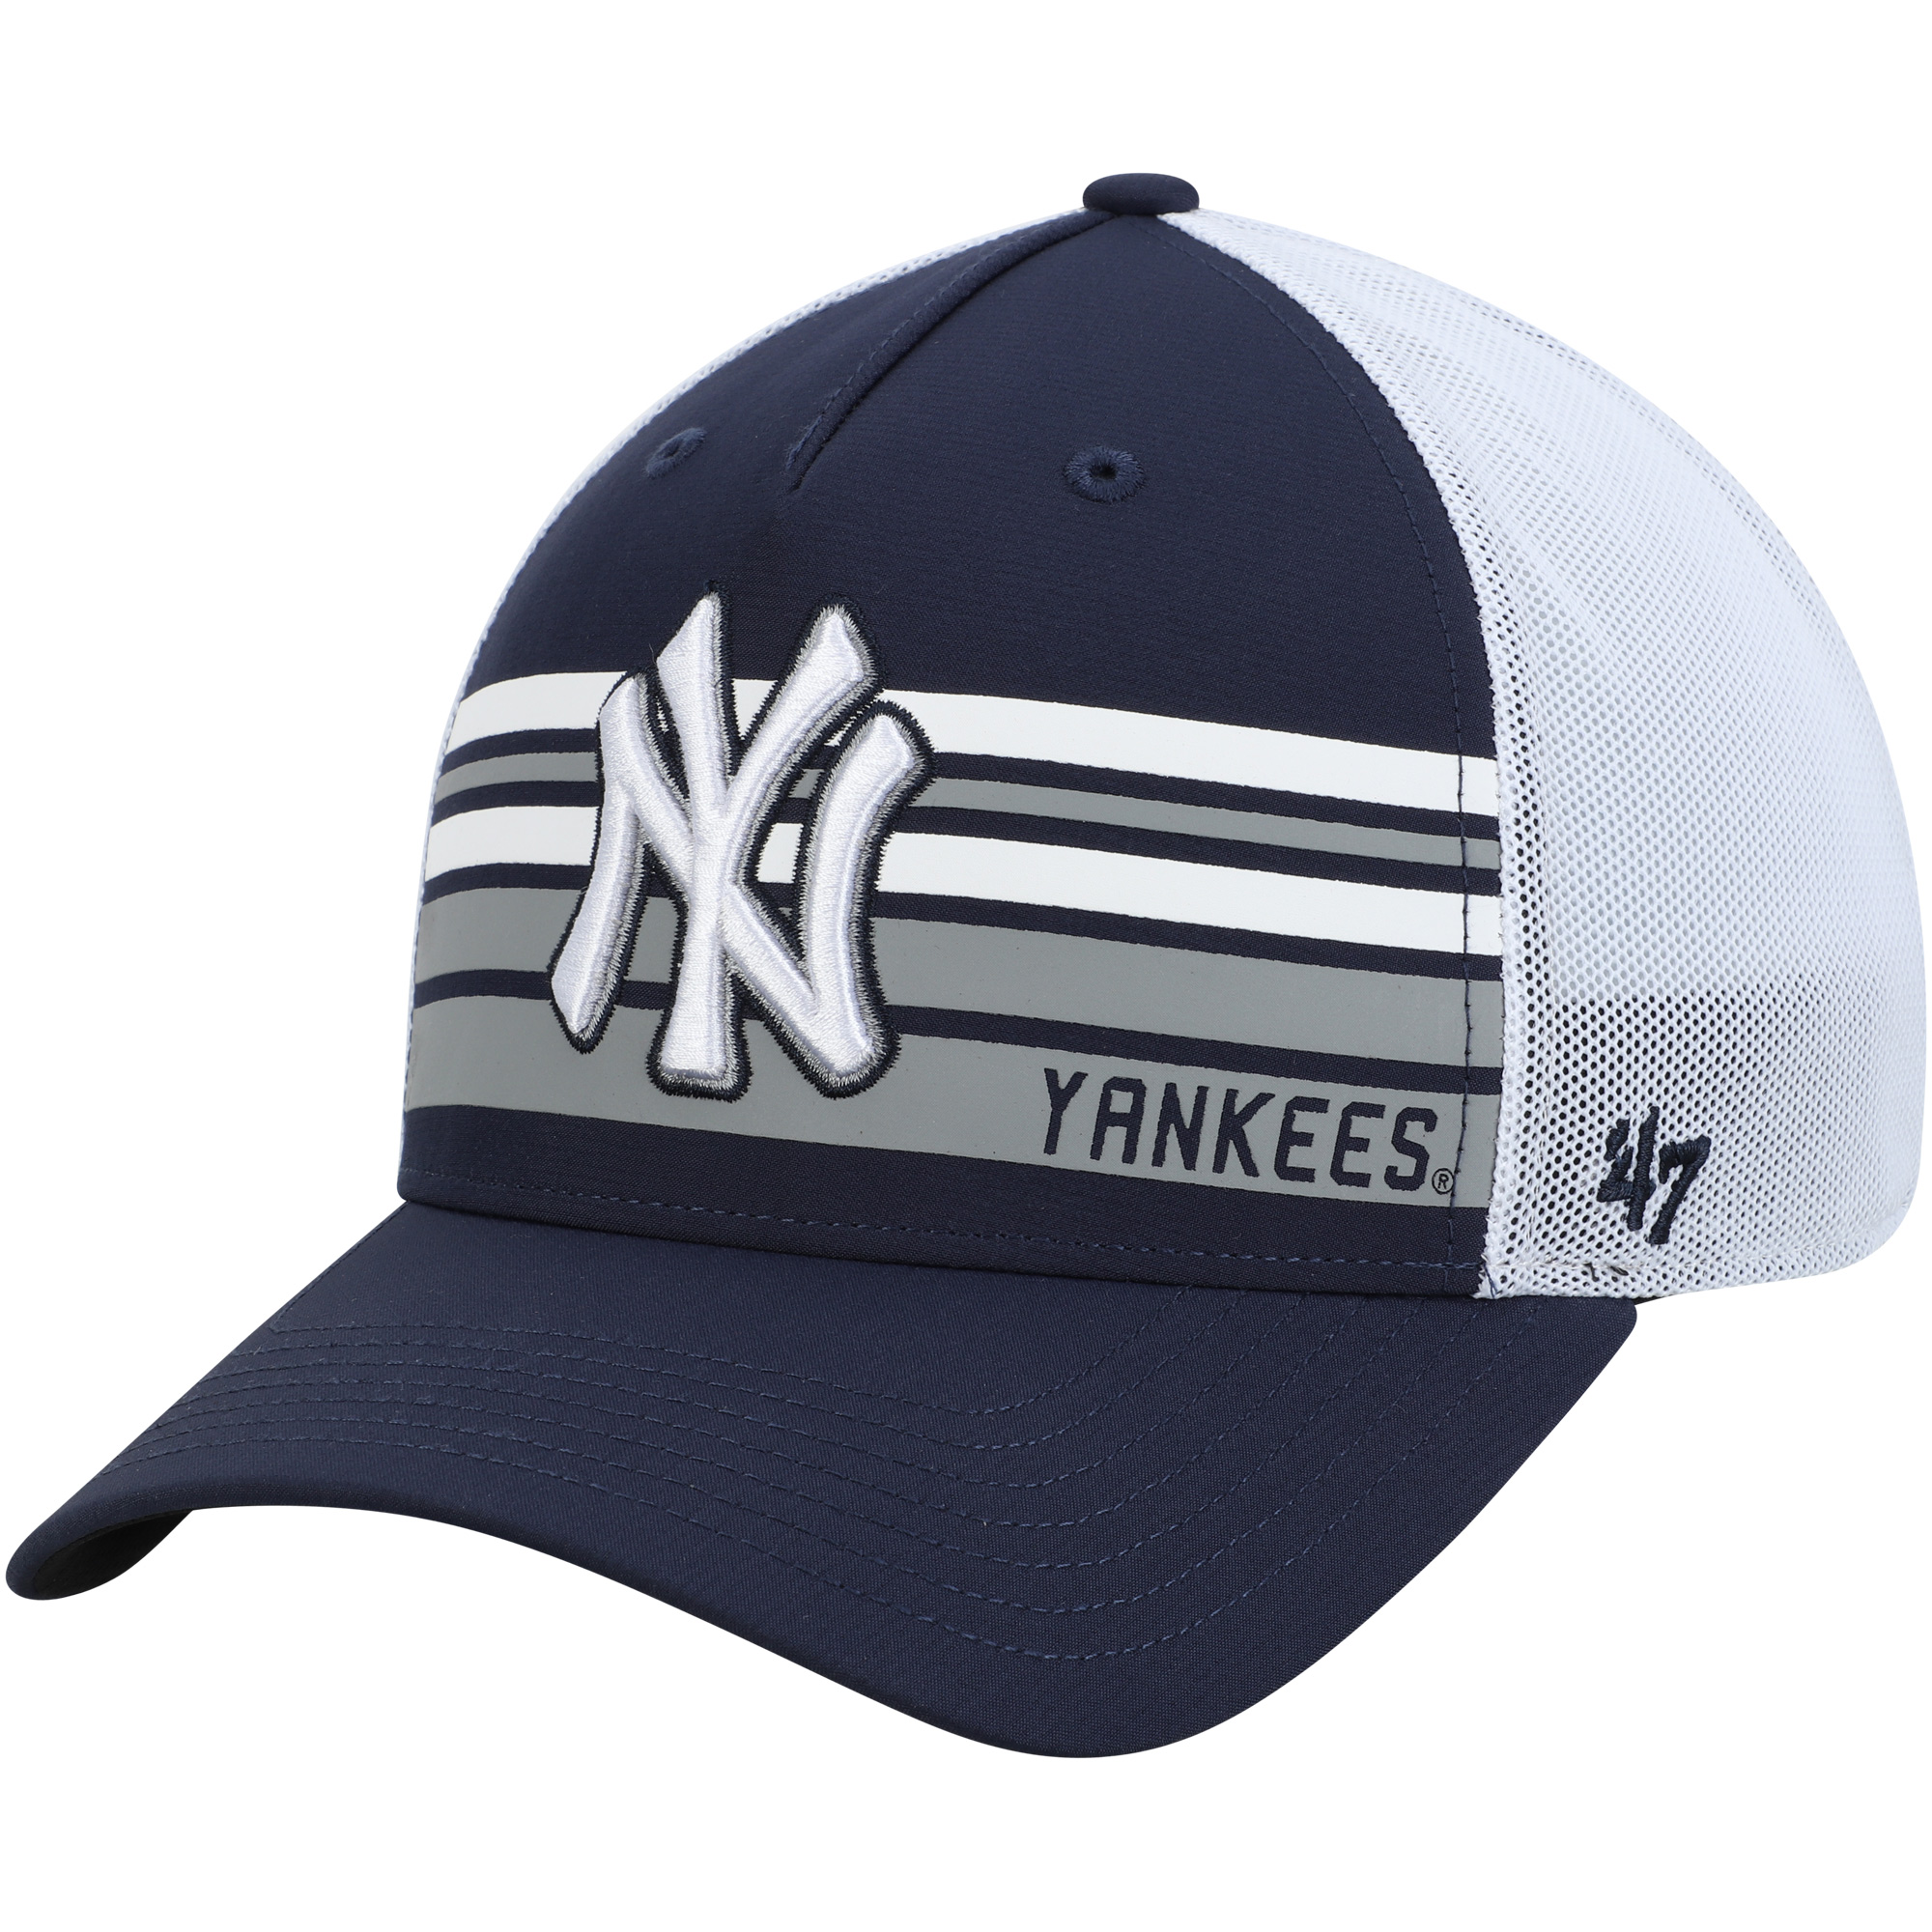 New York Yankees '47 Altitude MVP Adjustable Hat - Navy - OSFA